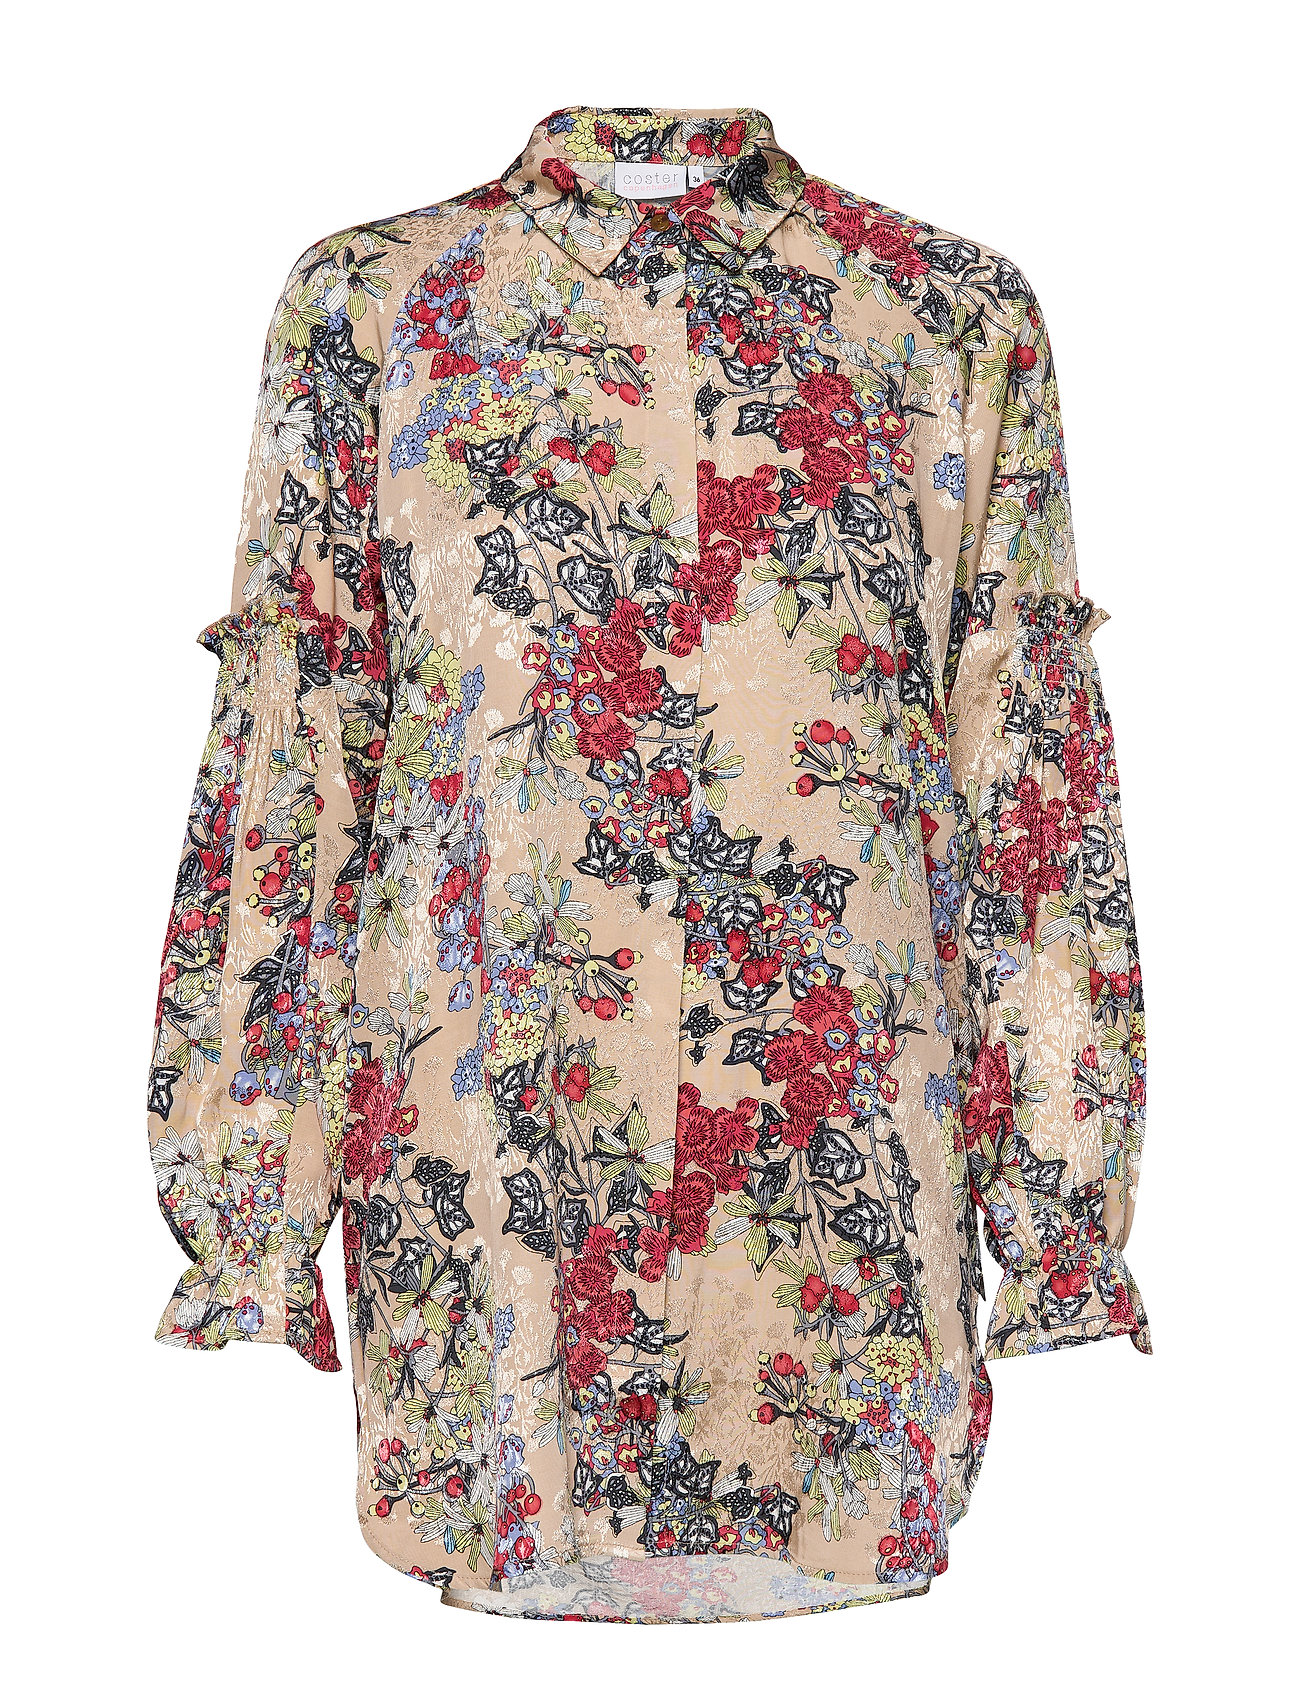 Coster Copenhagen Shirt in winter berry print - WINTER BERRY PRINT